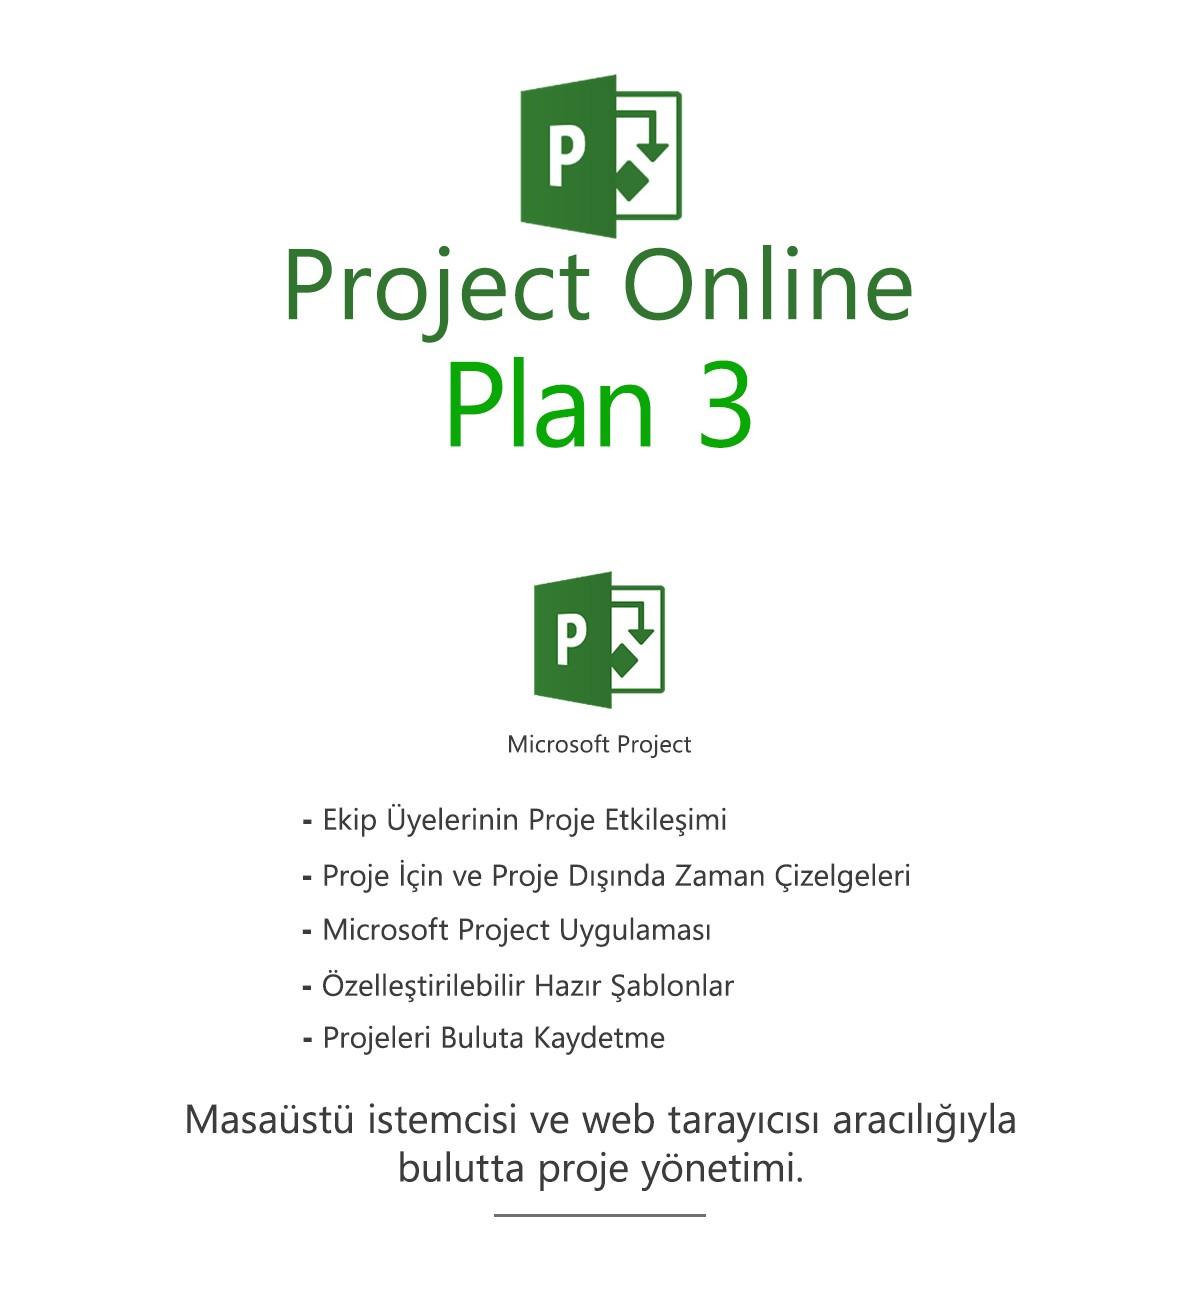 Project Online Plan 3